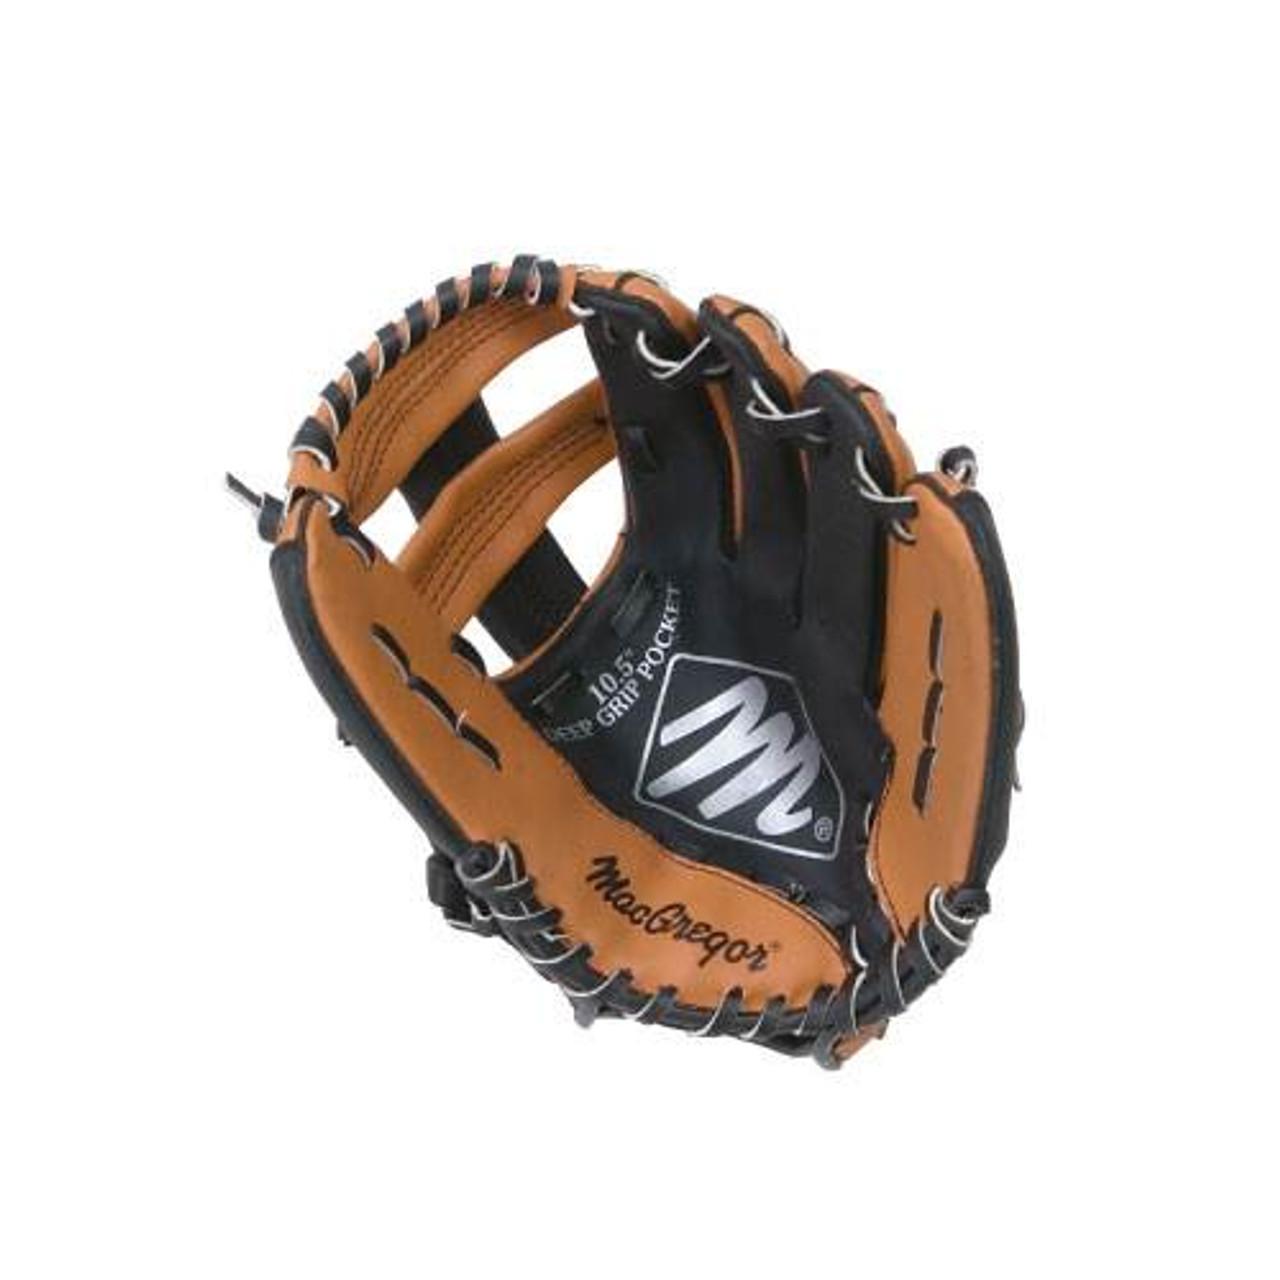 MacGregor Baseball 10-1/2'' Tee Ball Glove LHT